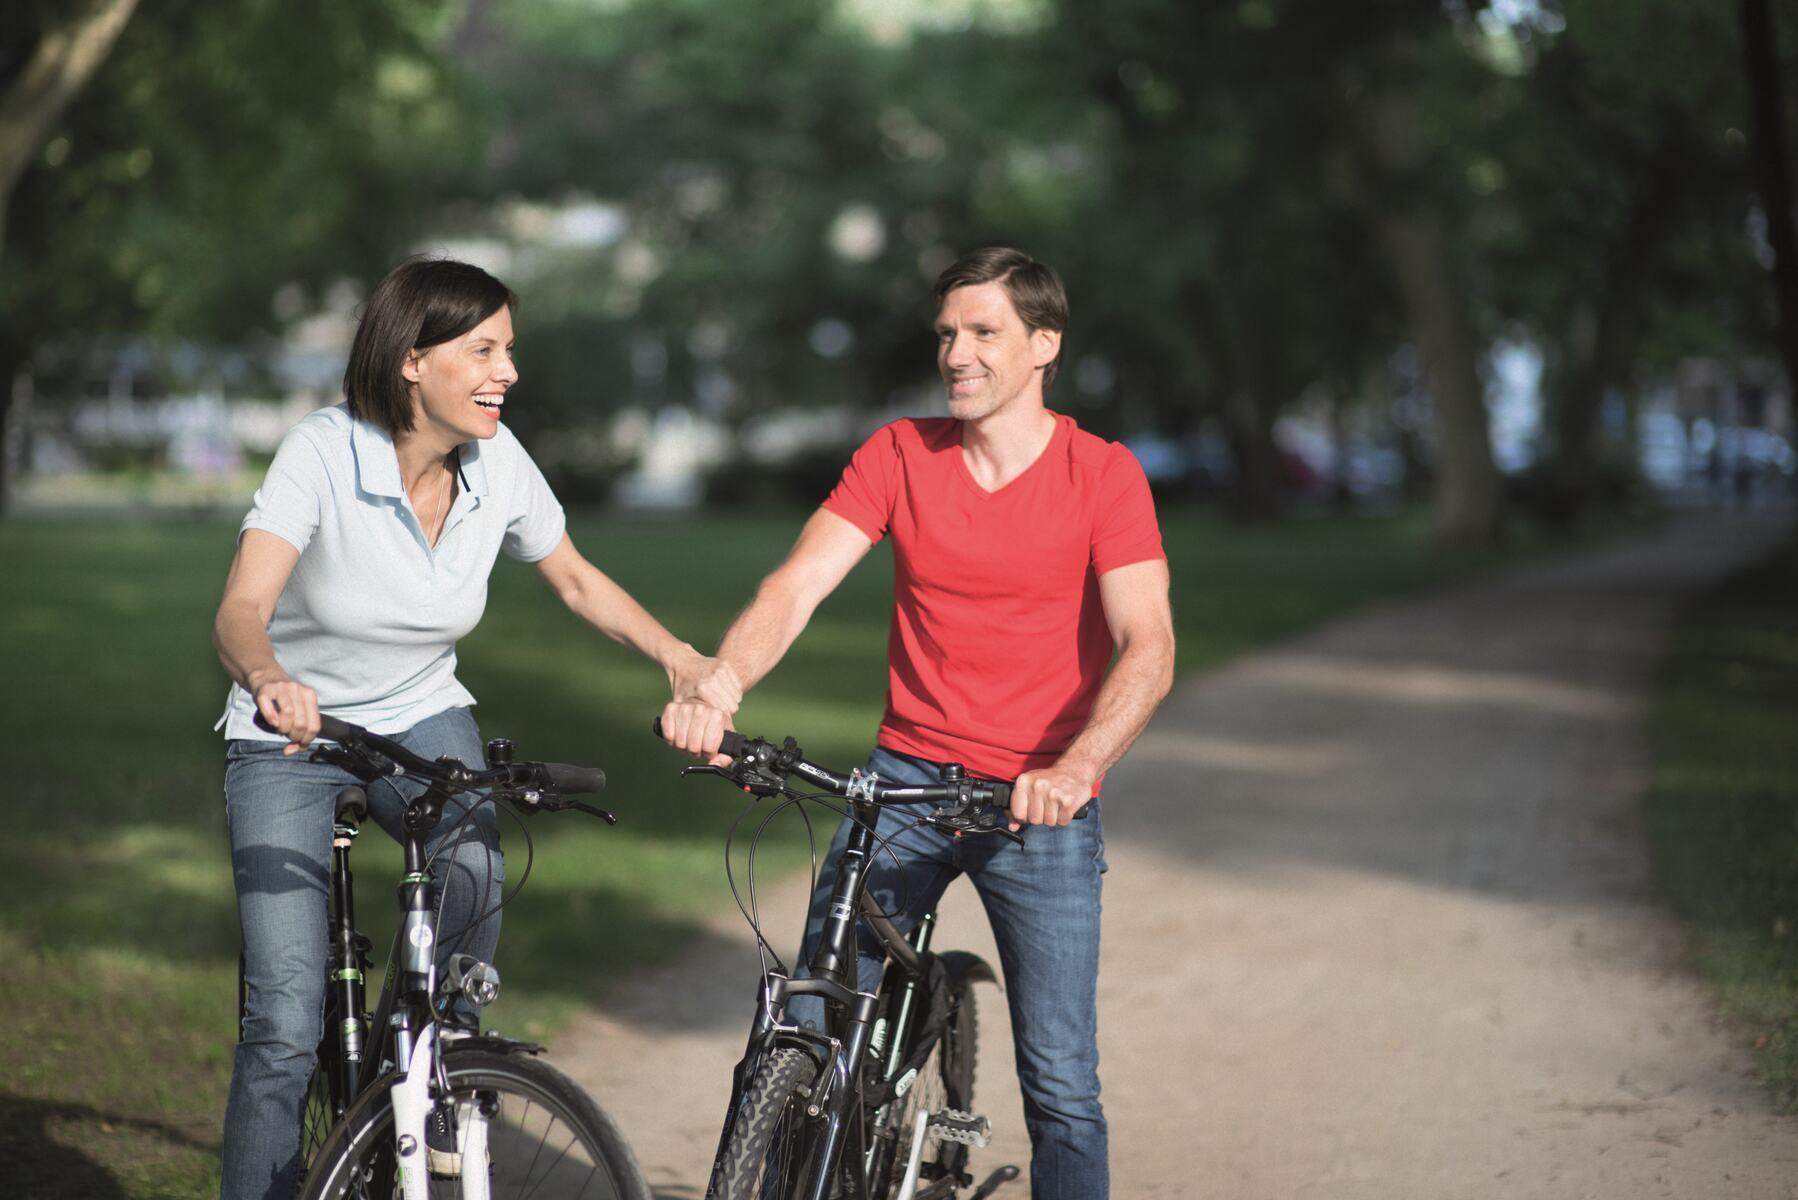 Sommerurlaub 2020 Bad Kissingen - Fahrradtour